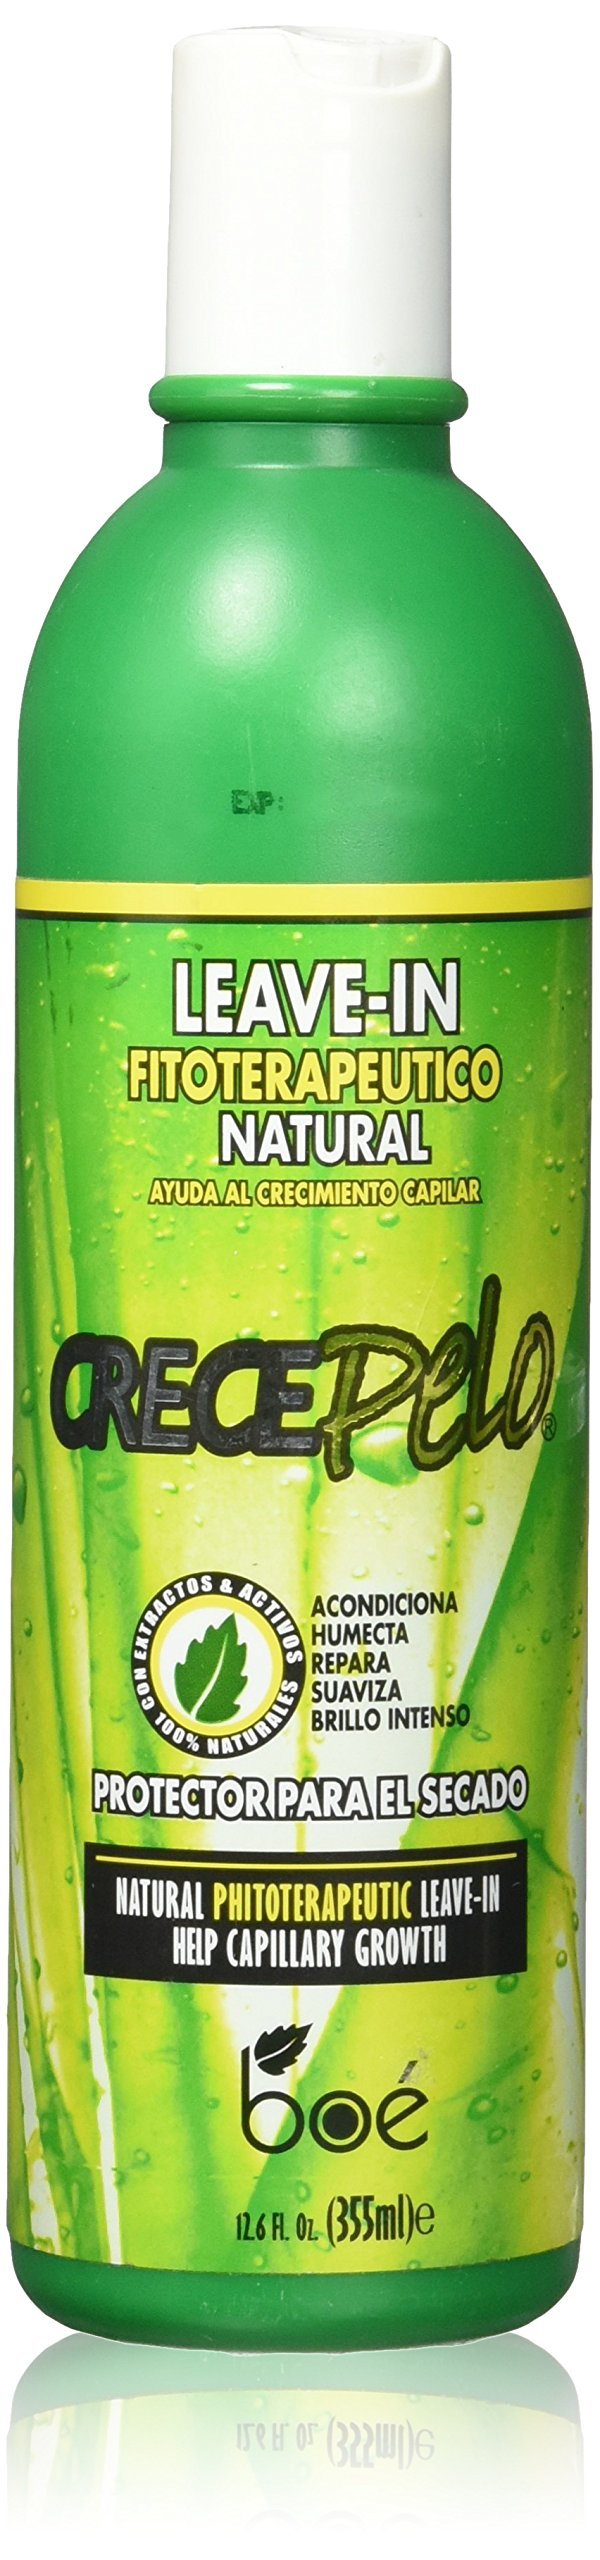 BOE Crece Pelo Natural Leave-In, 12.6 Ounce